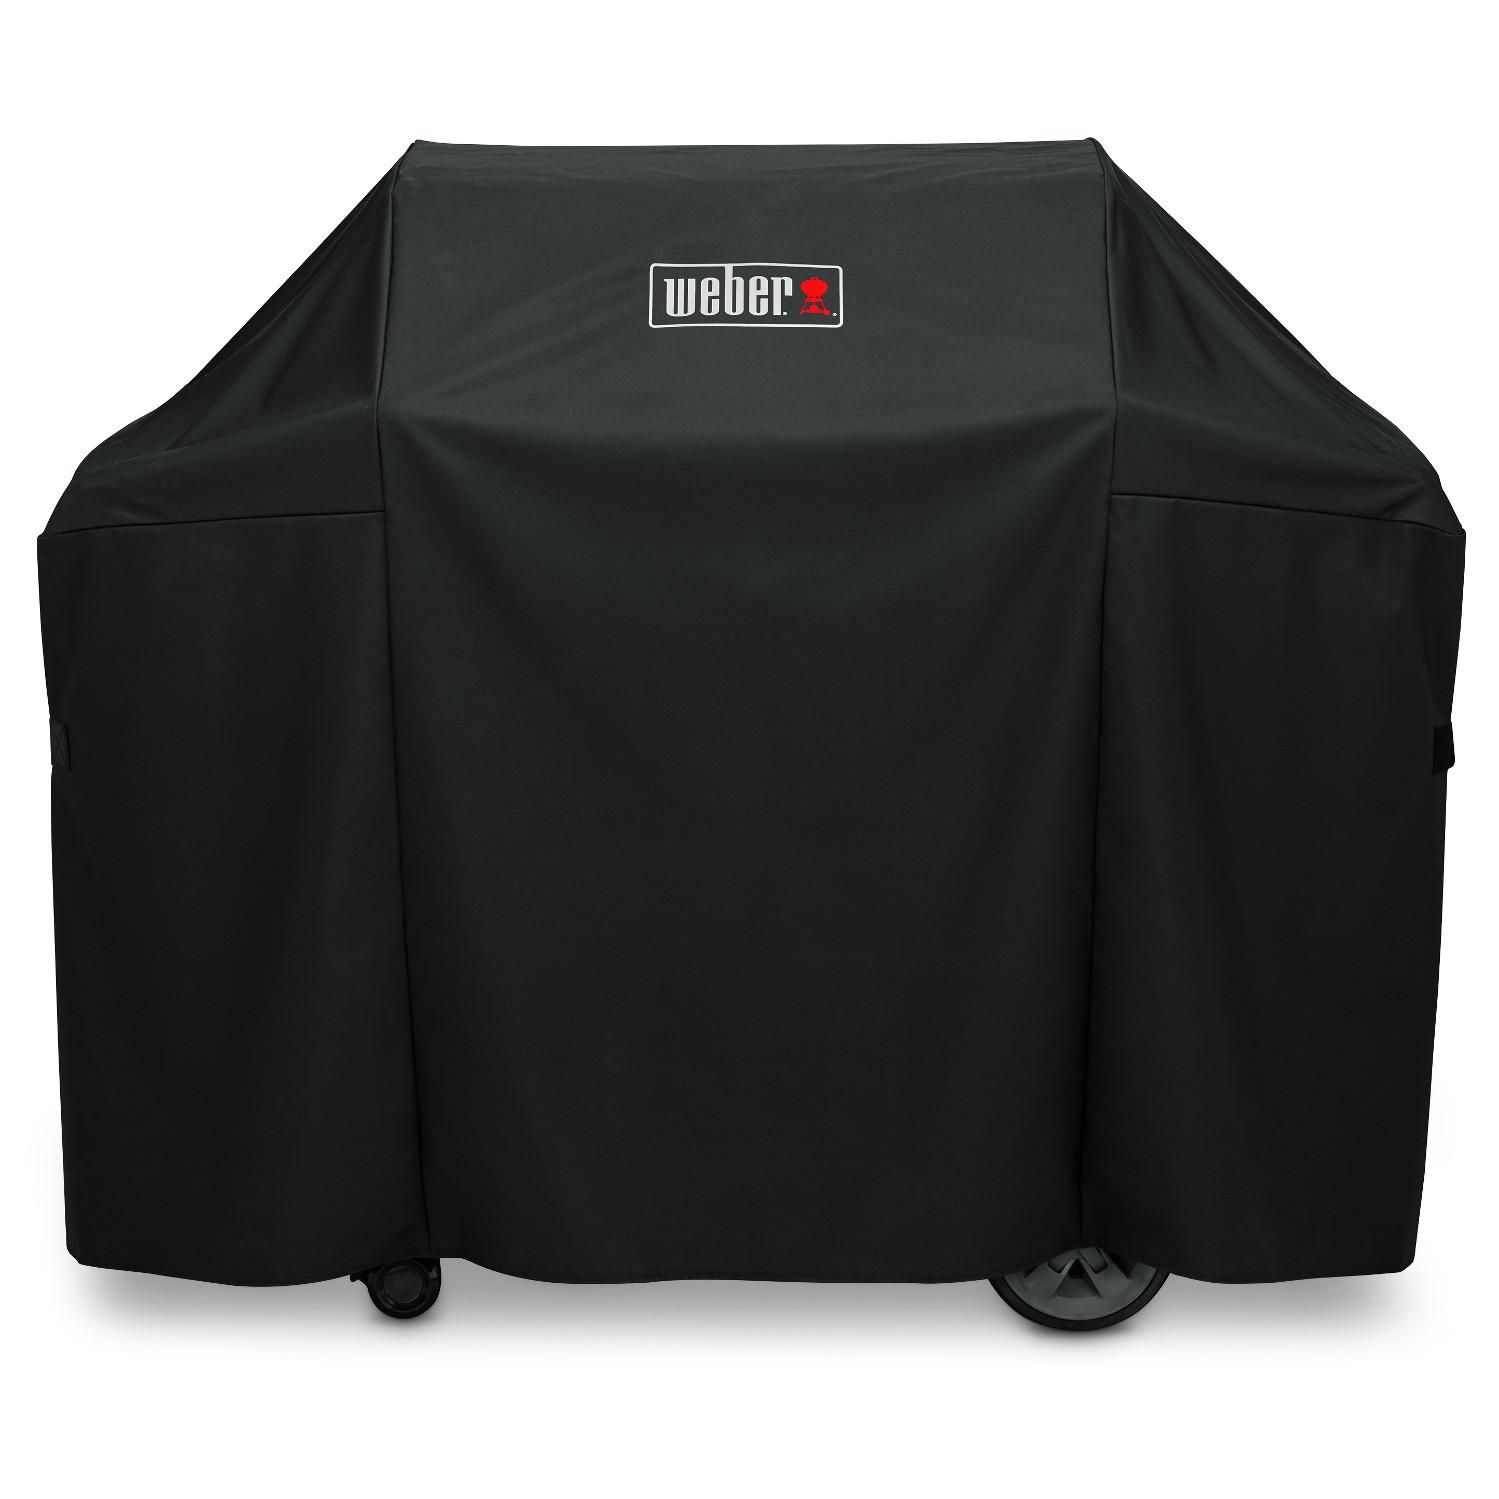 Weber 7130 Premium Polyester Genesis Ii 3b Grill Cover Bbqguys In 2020 Weber Grill Cover Grill Cover Gas Grill Covers